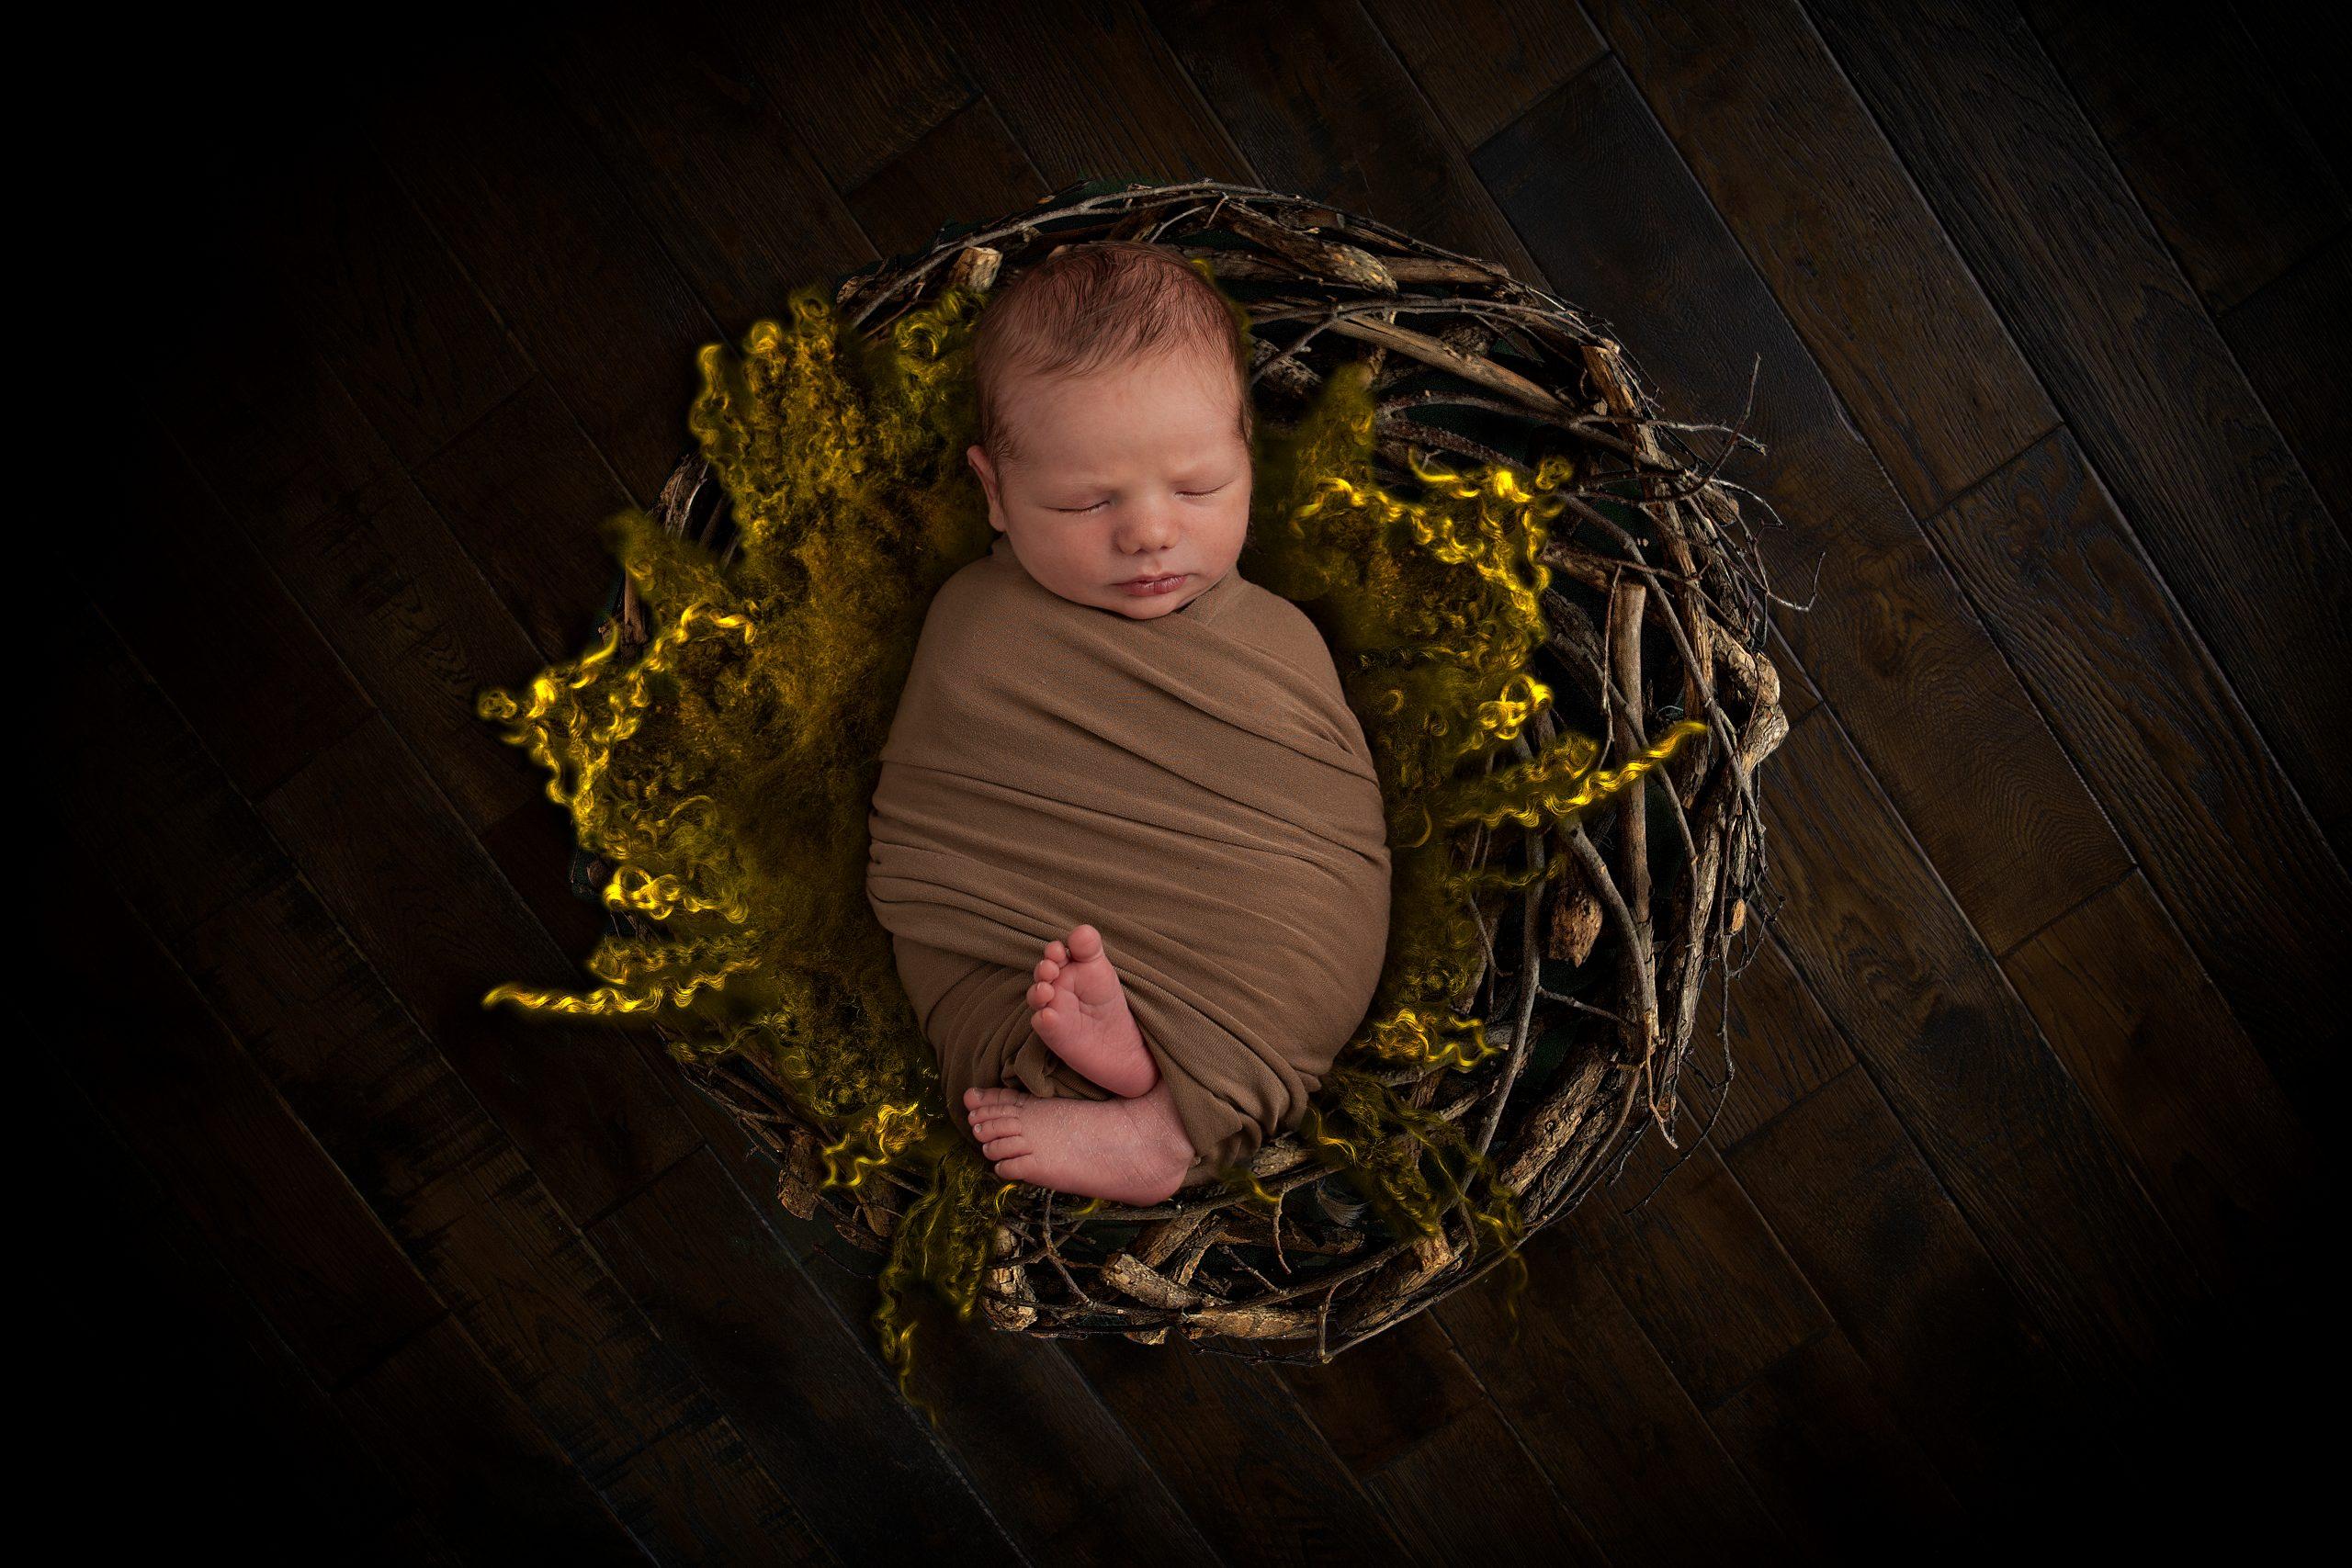 Newborn Photographer North Vancouver - Wrapped Newborn Baby boy sleeping in a wreath